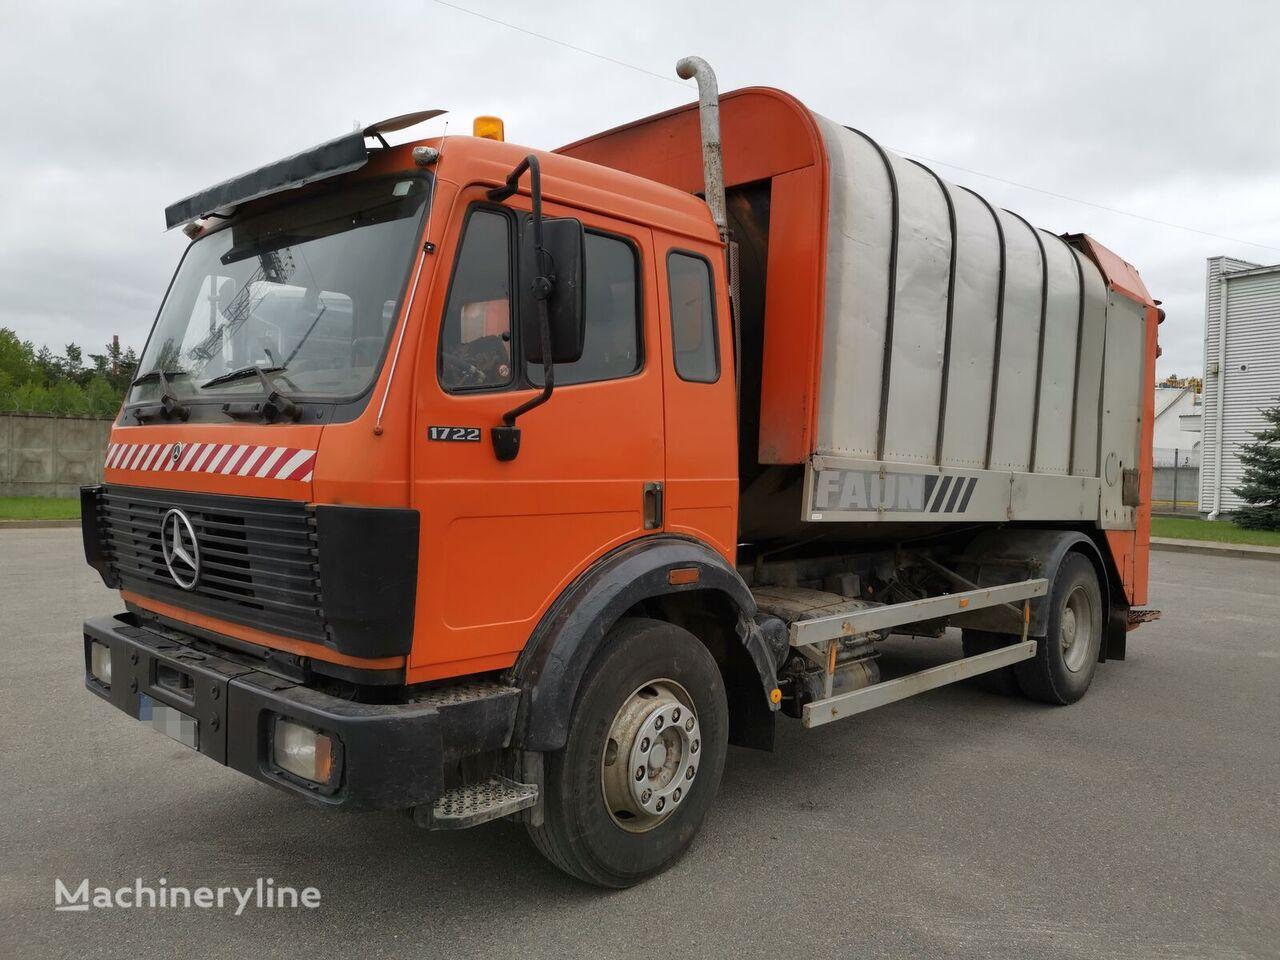 MERCEDES-BENZ 1722 kamion furgon